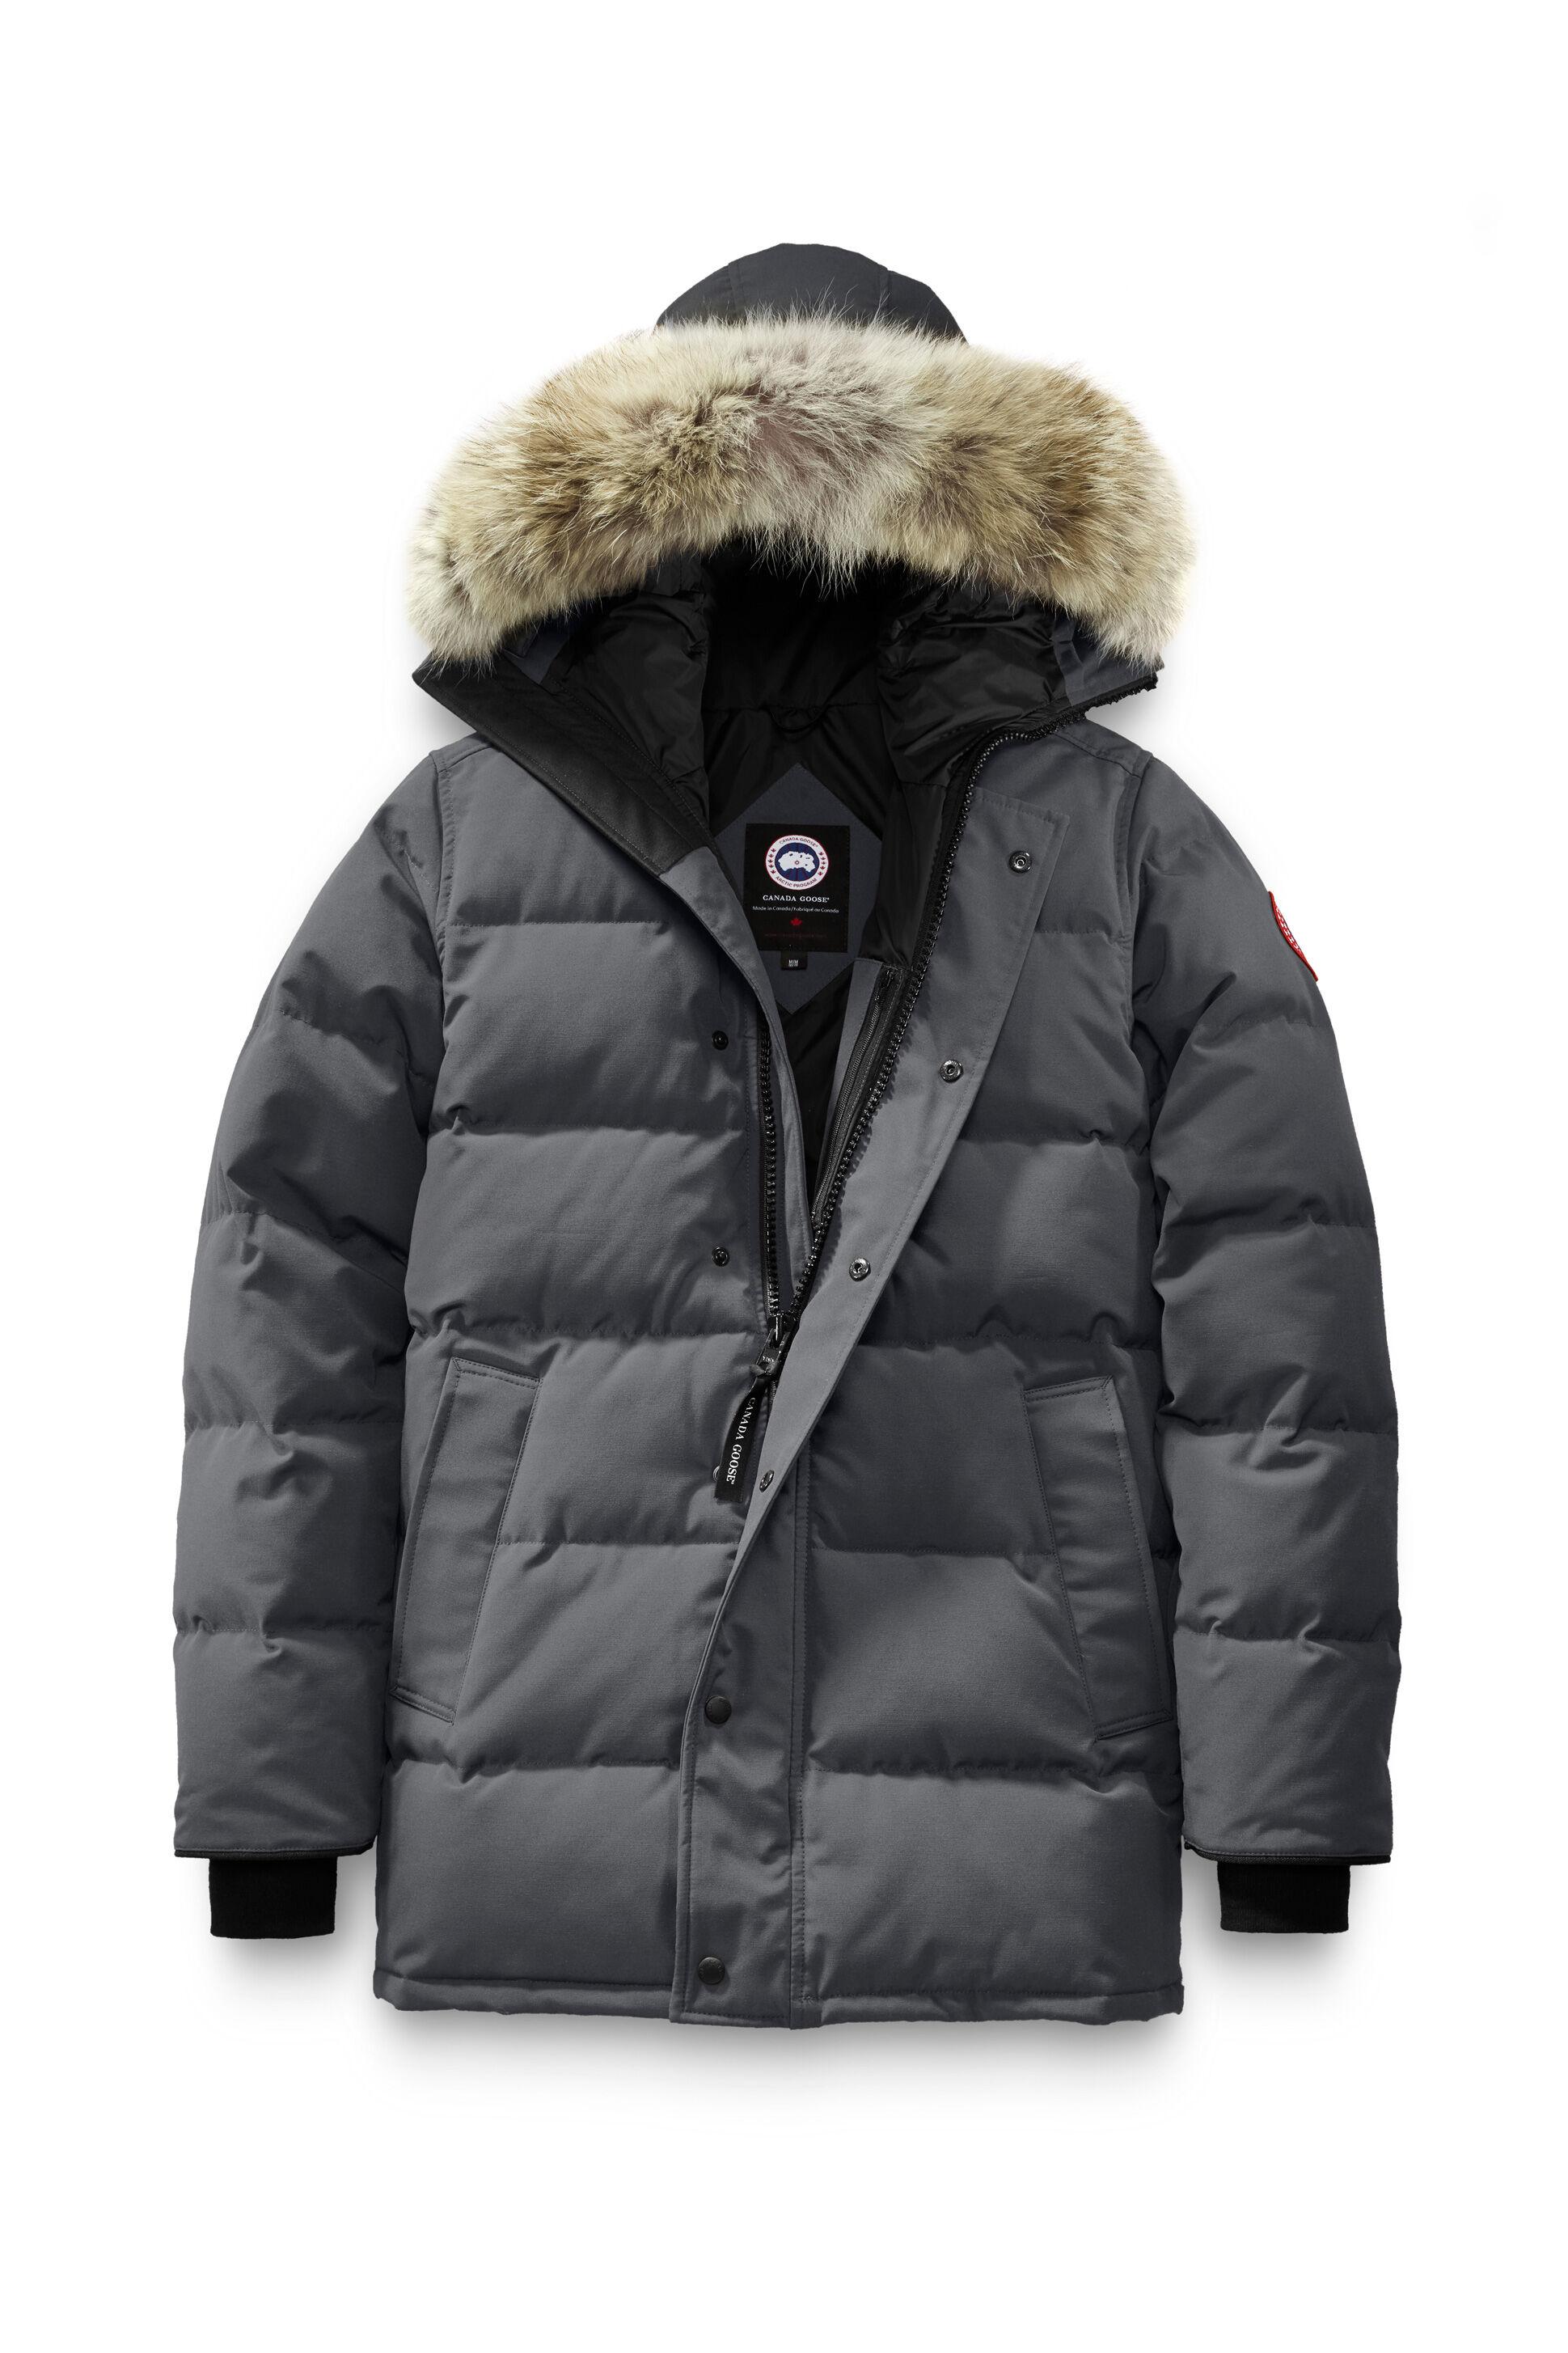 canada goose parka jakke